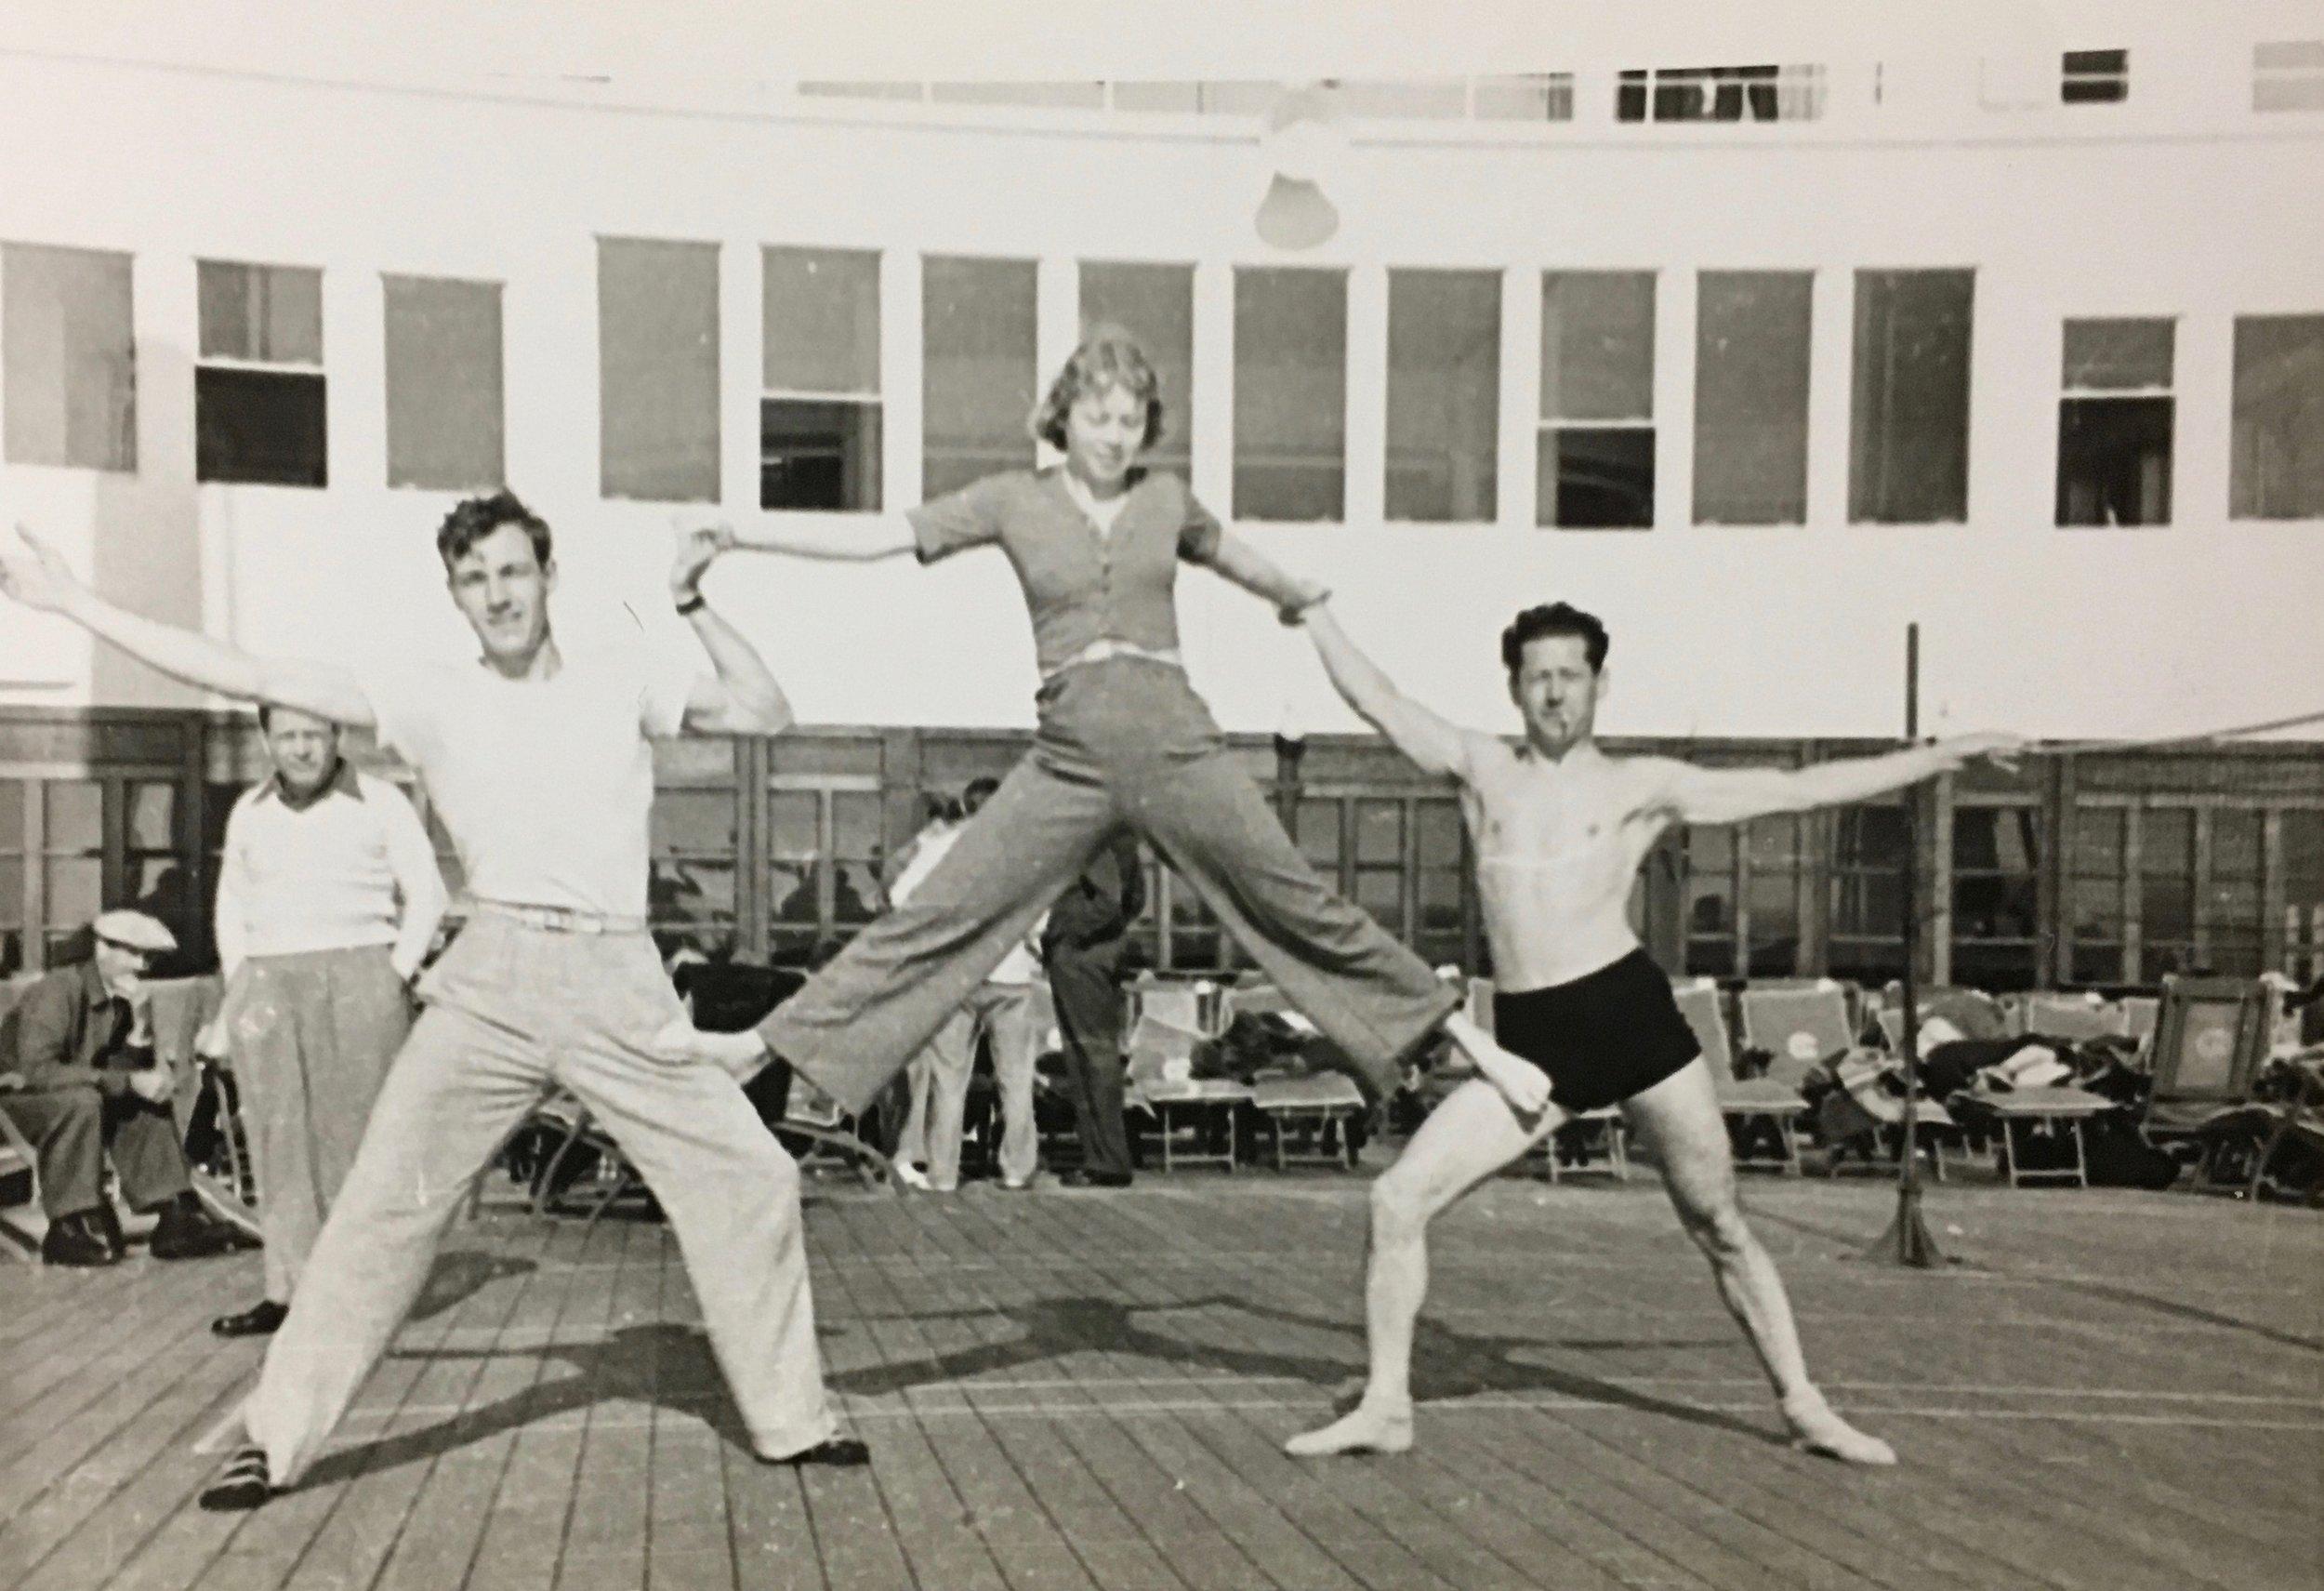 REW aboard the ocean liner Champlain, 1939